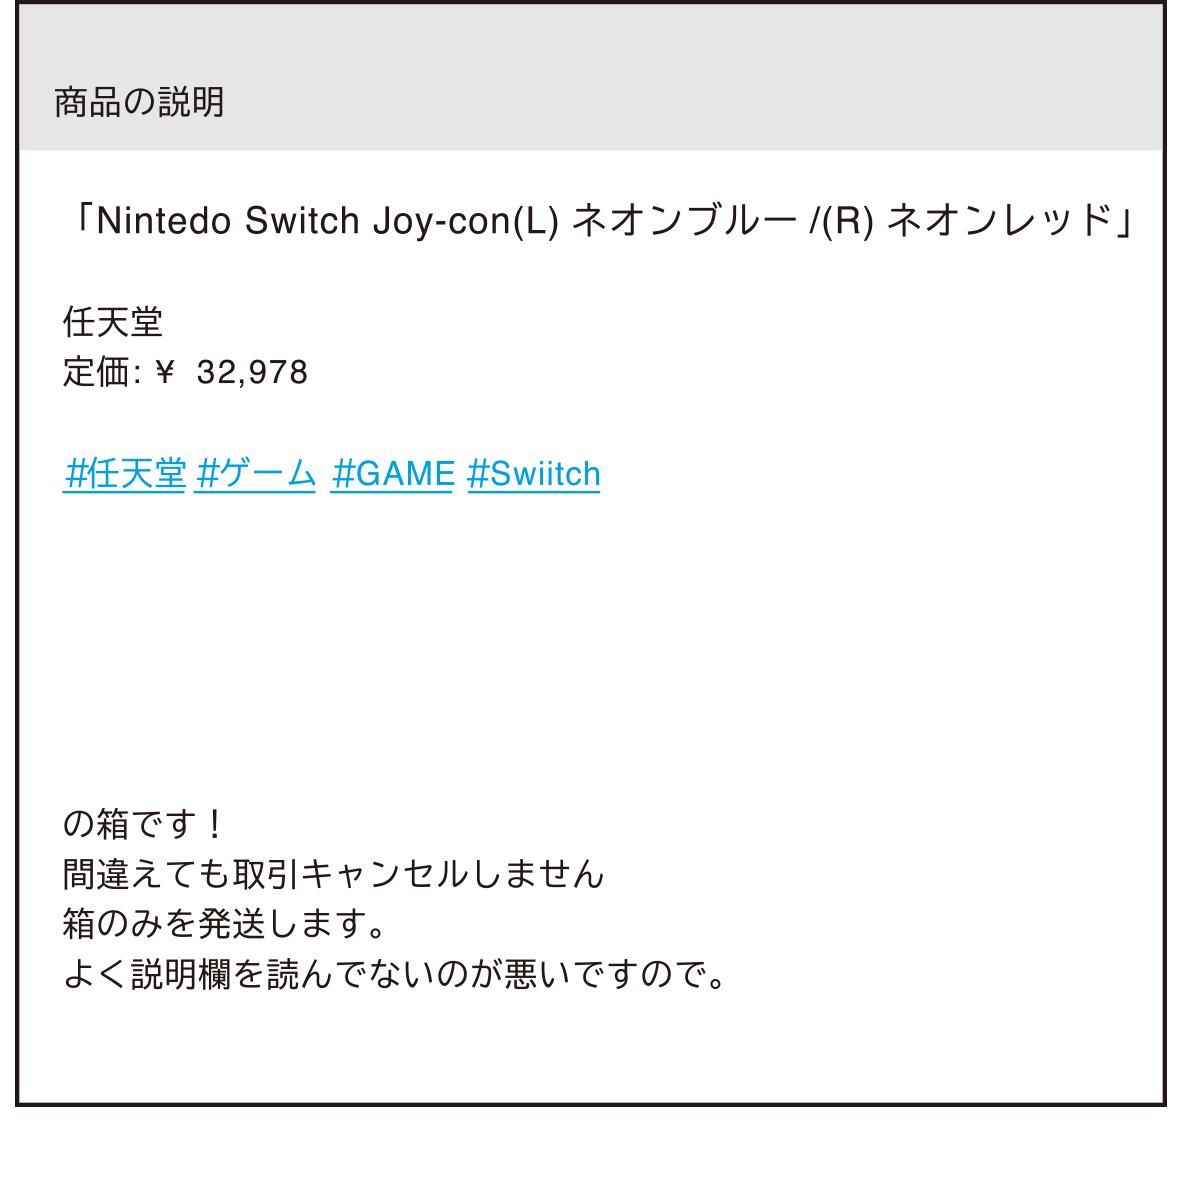 Nintendo Switch 詐欺 メルカリ 箱